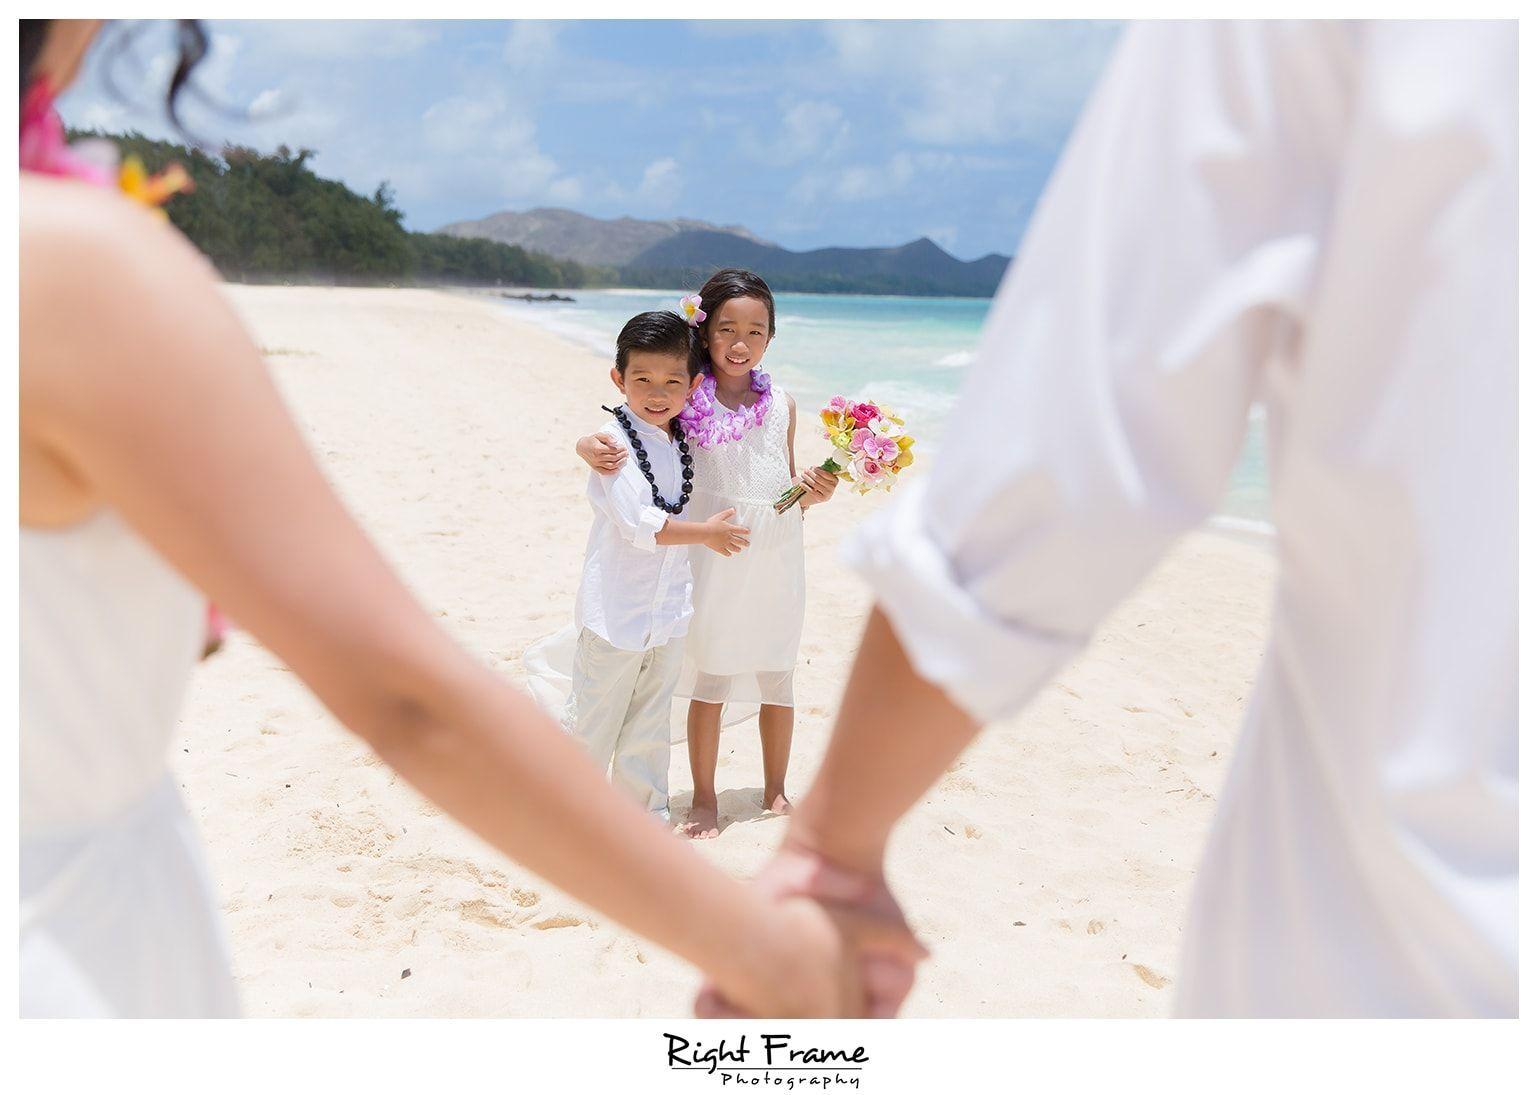 Wedding renewal dresses for beach  rightframe  Beautiful Destination Wedding Vow Renewal in